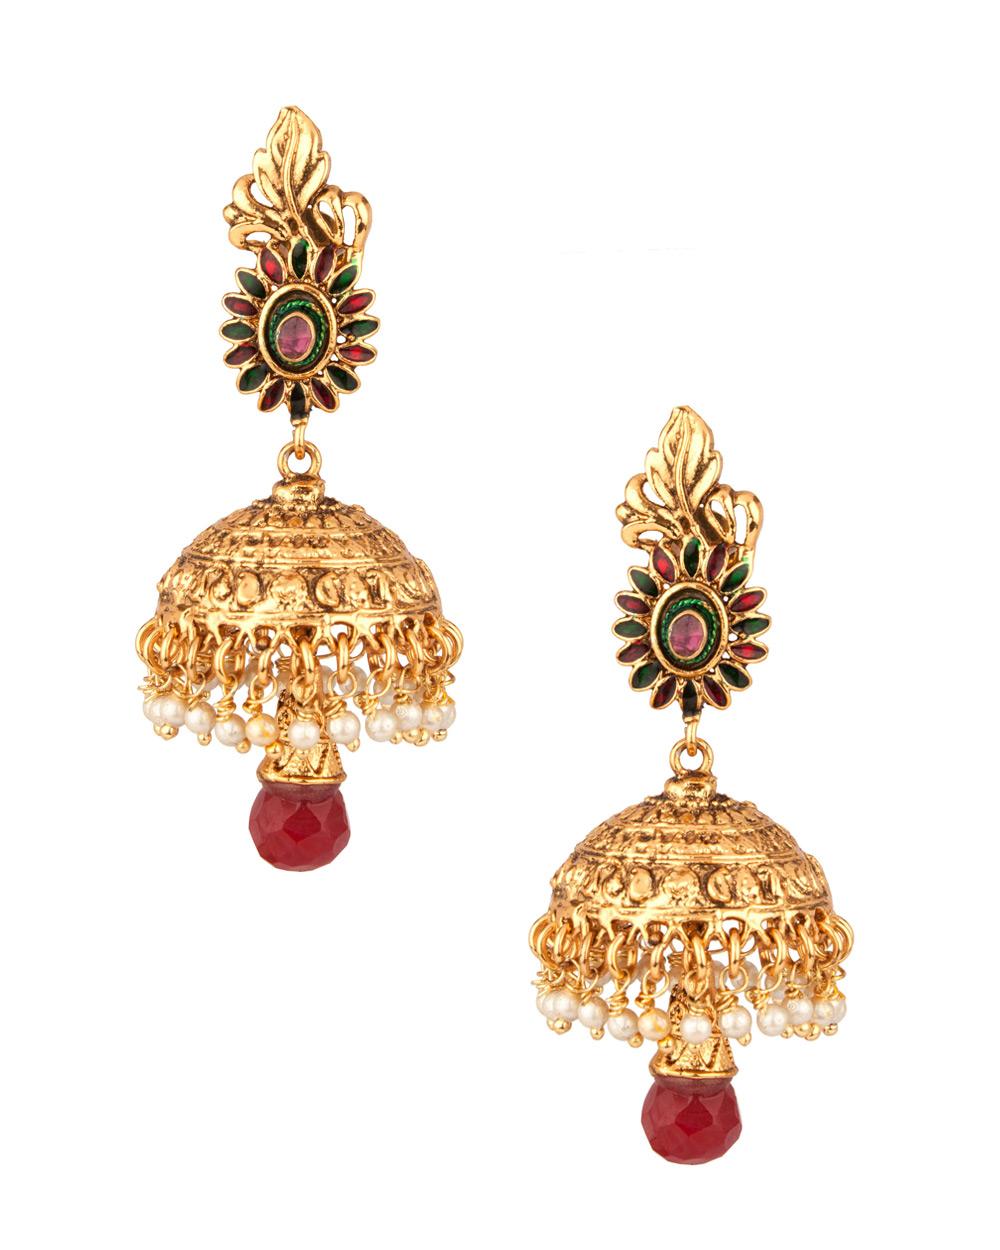 Buy Ethnic Golden Jhumka With Pearl Drops Online India | Voylla